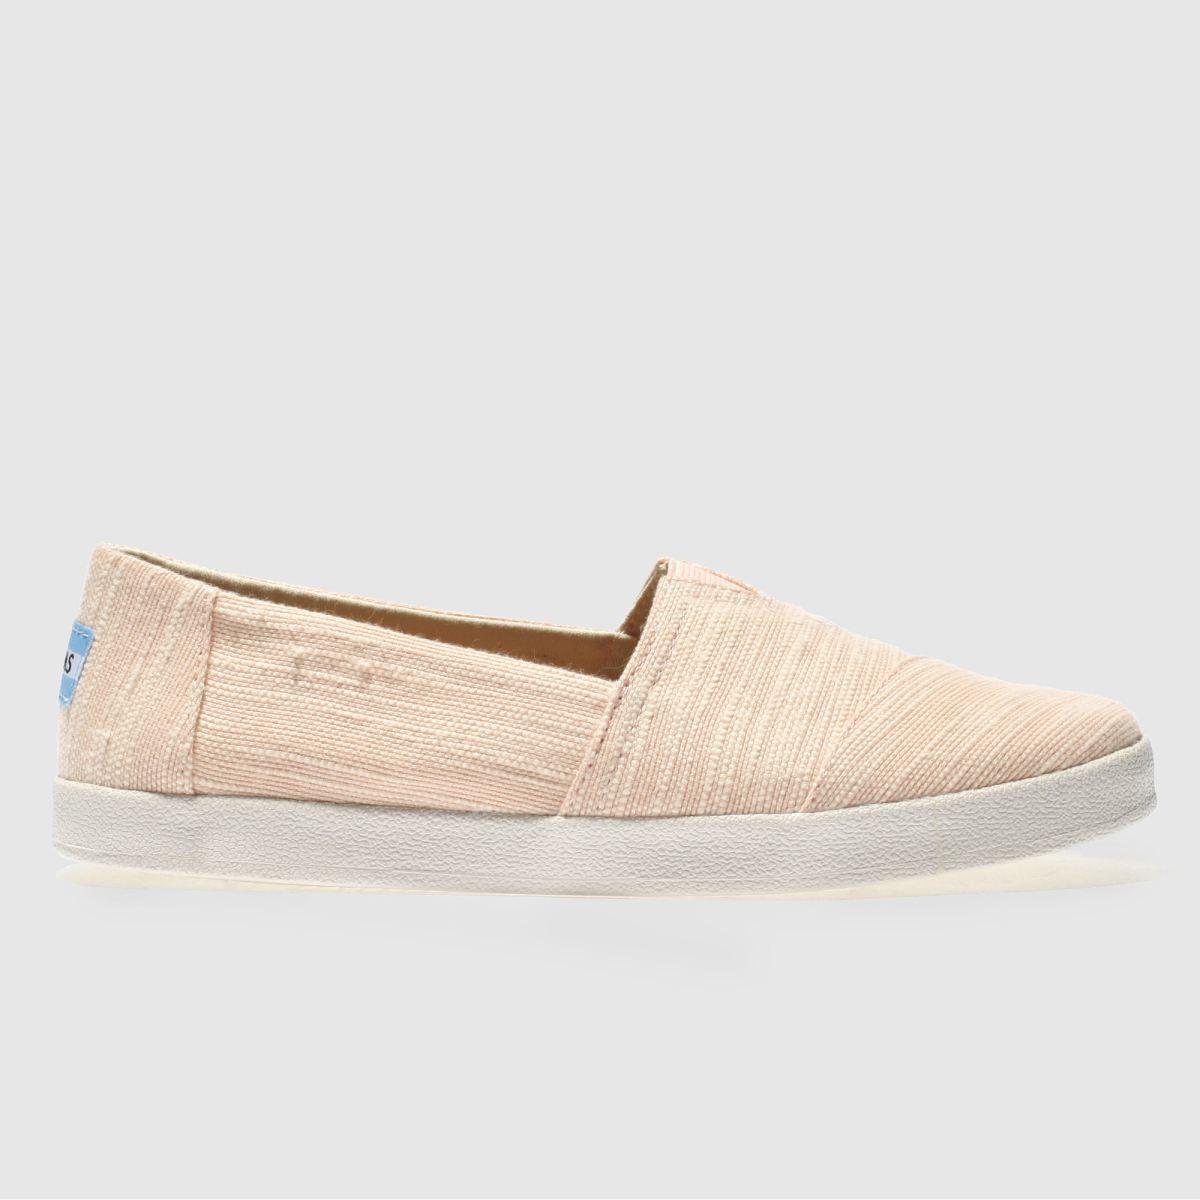 Toms Pale Pink Avalon Flat Shoes